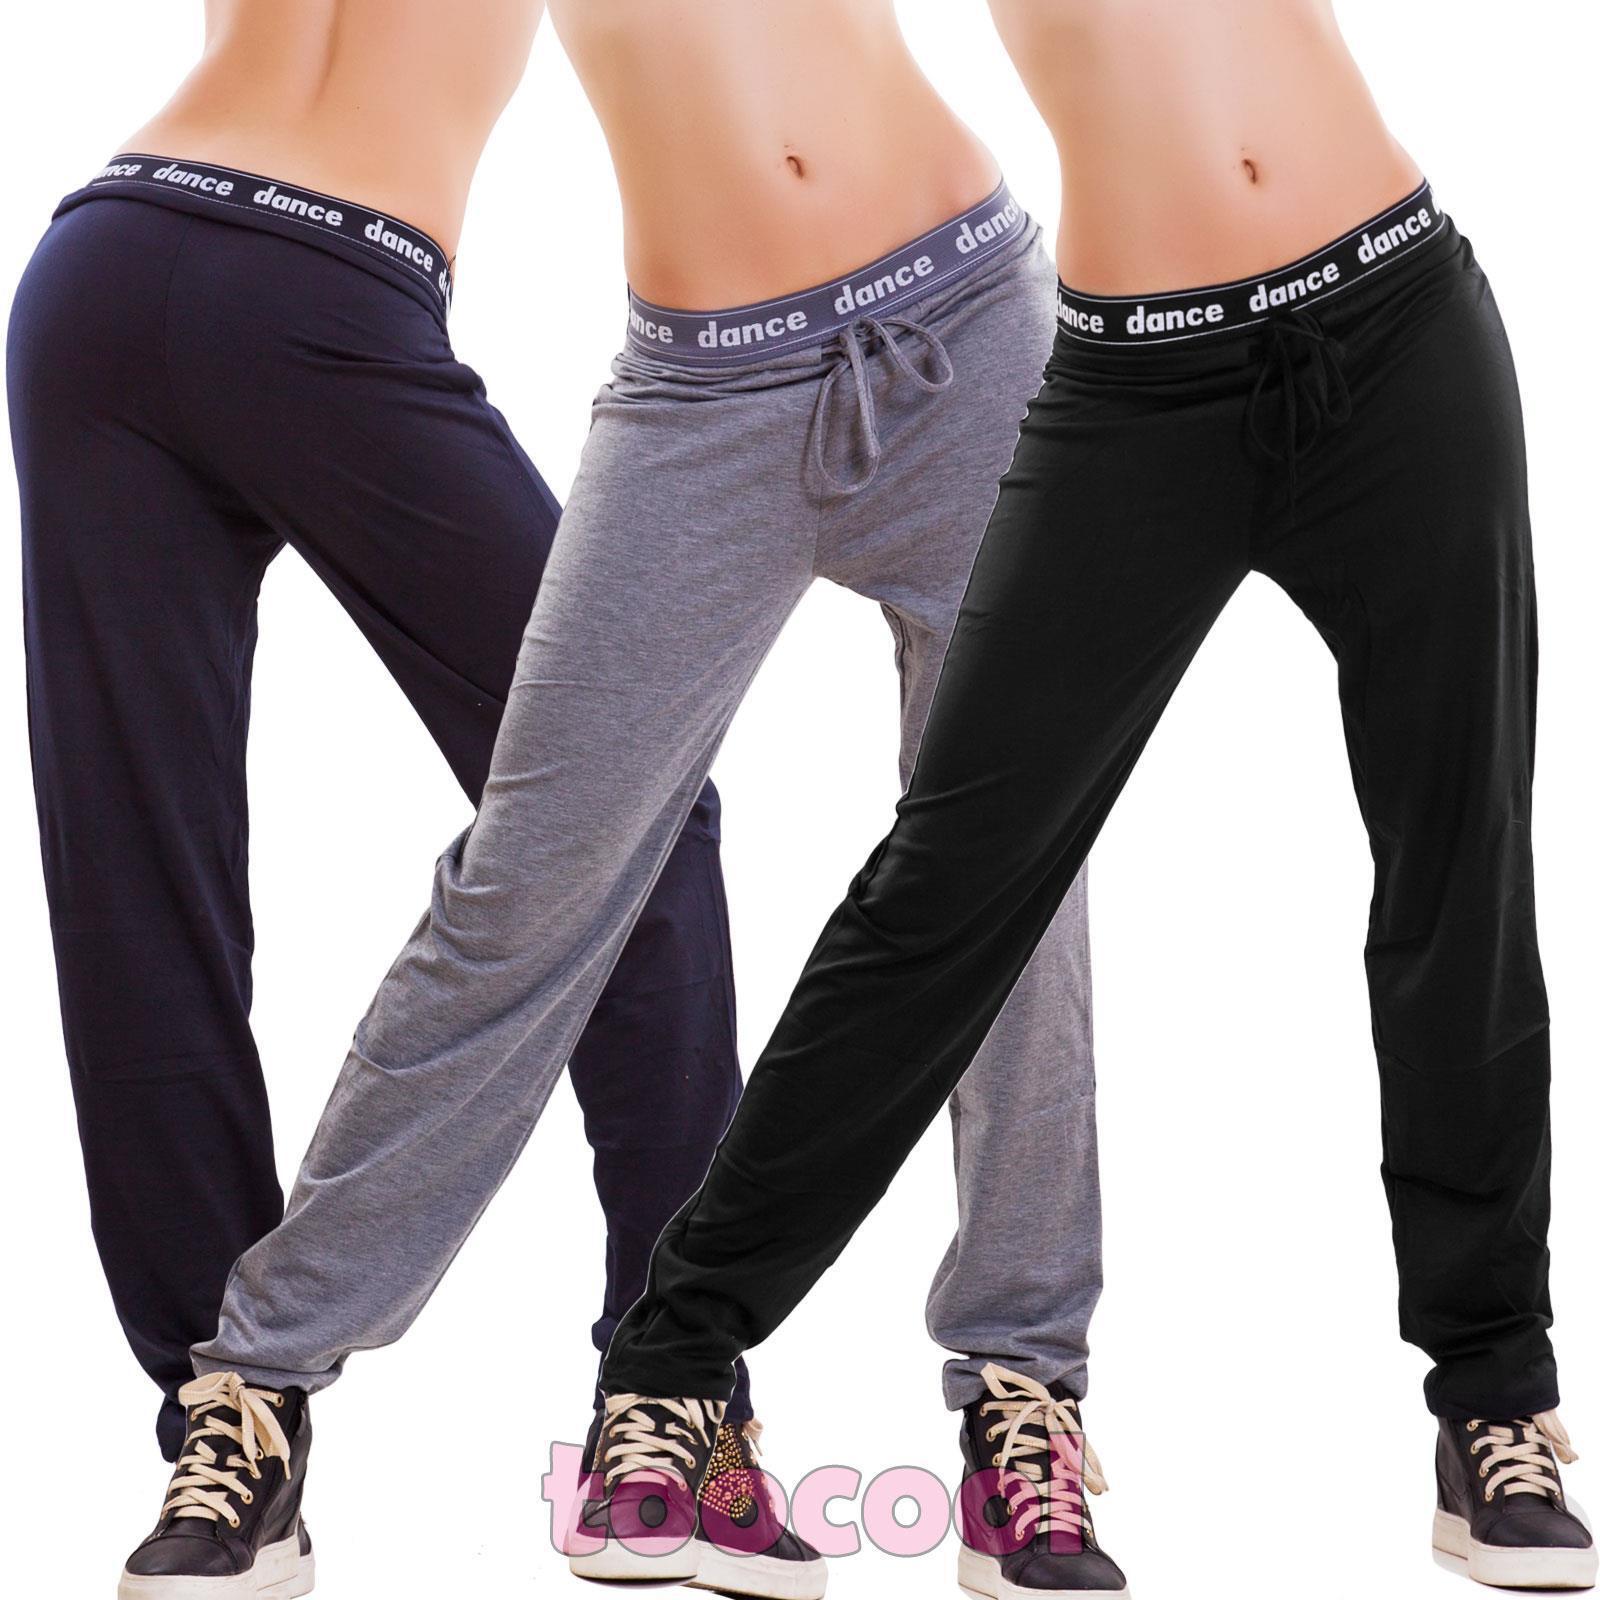 Pantalones de women chándal danza fitness deportivos tiro caído hip hop K-51